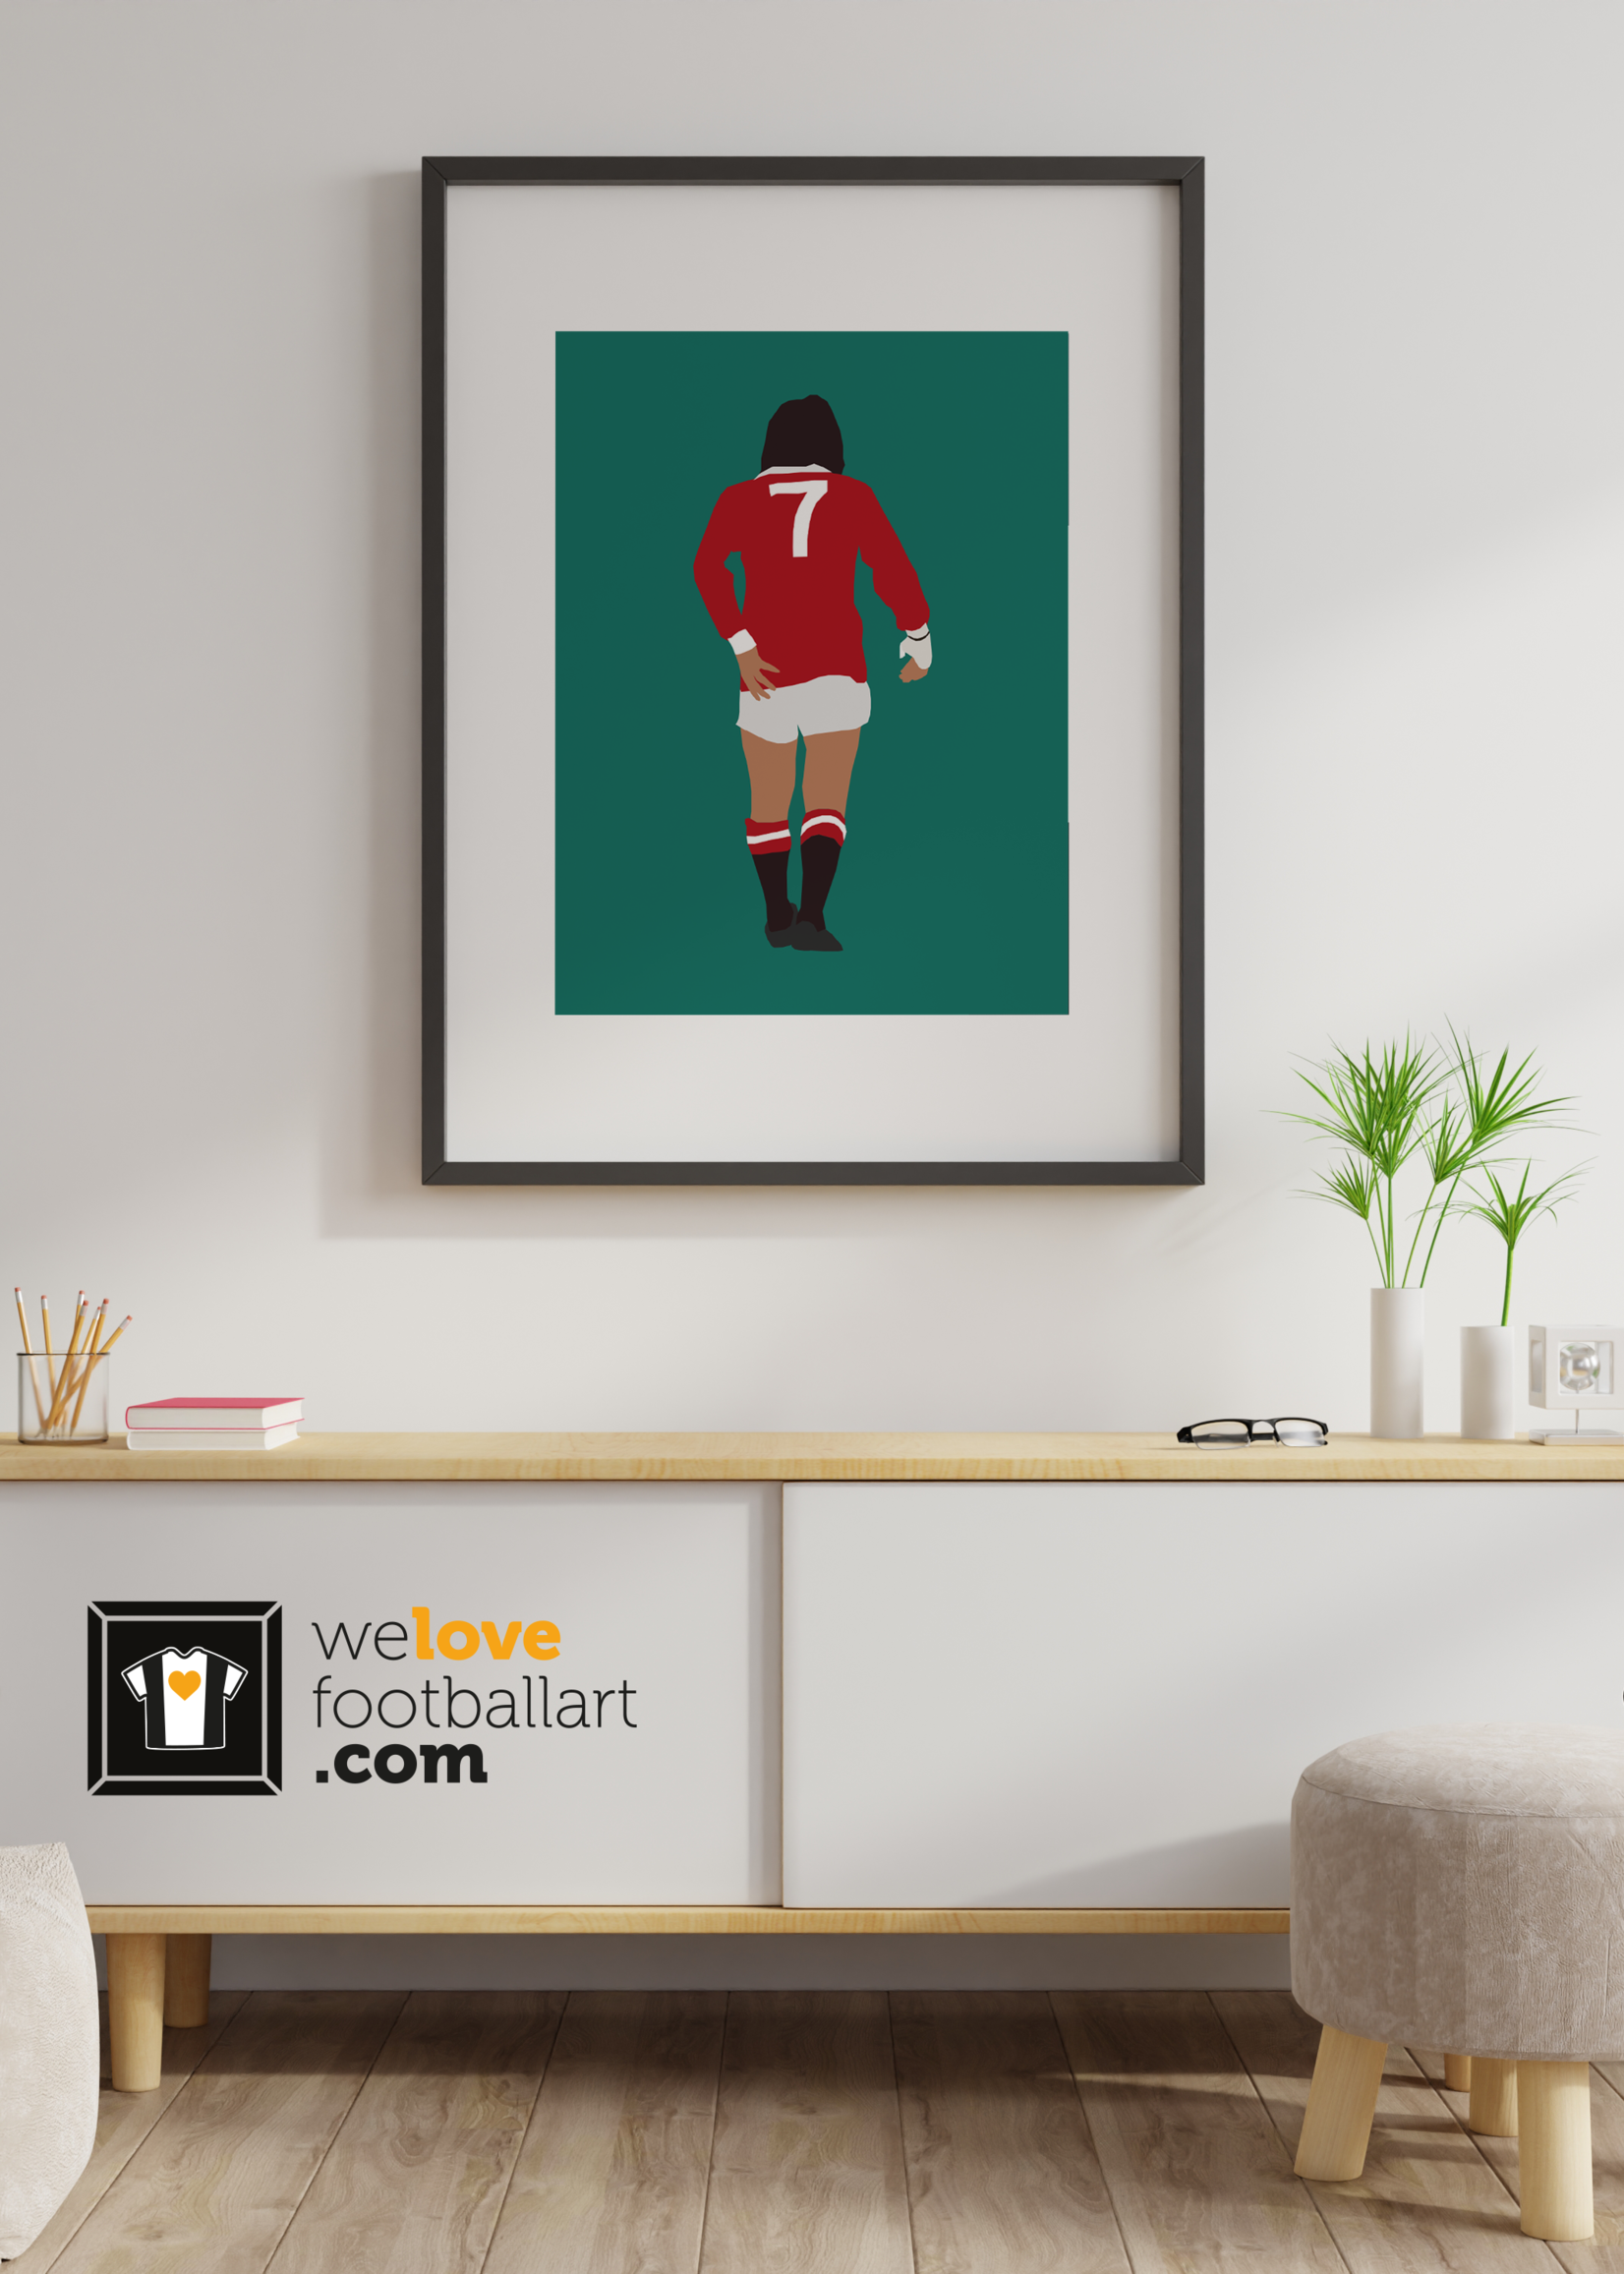 "We Love Football Art ""Der funfte Beatle"" We Love Football Art"